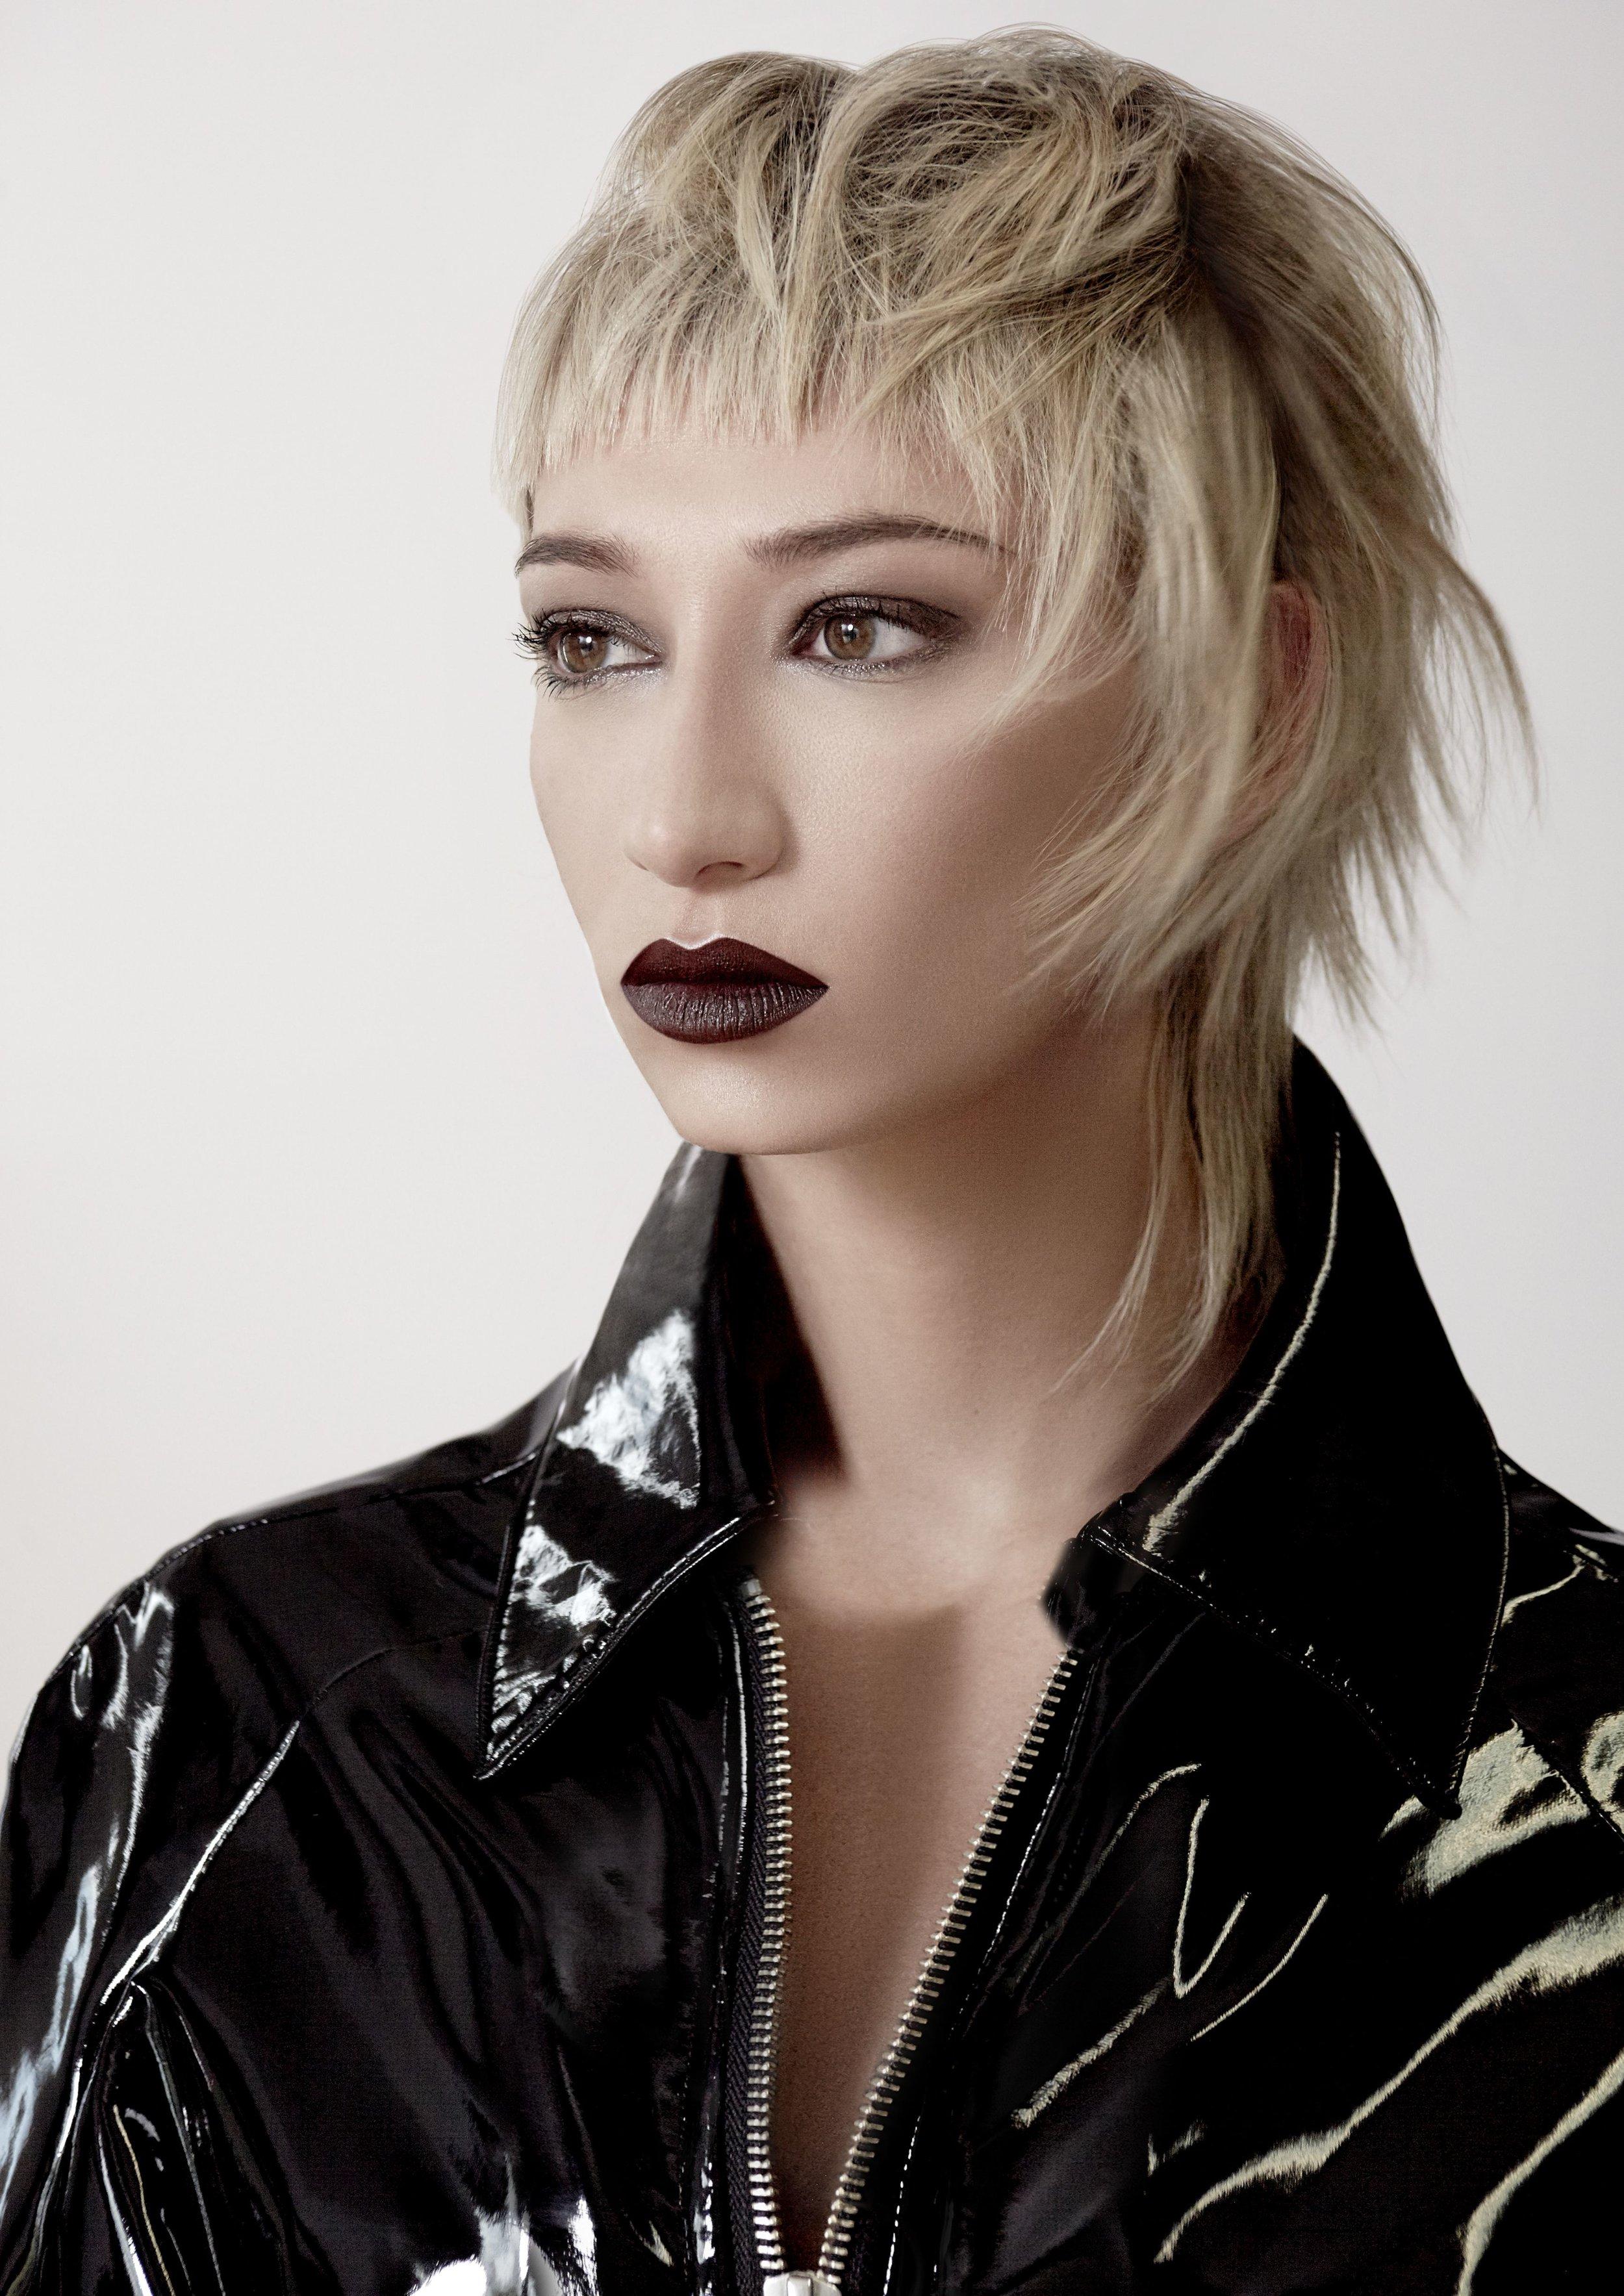 HairExpo_SalonTeam_IMAGE .4 copy.jpg